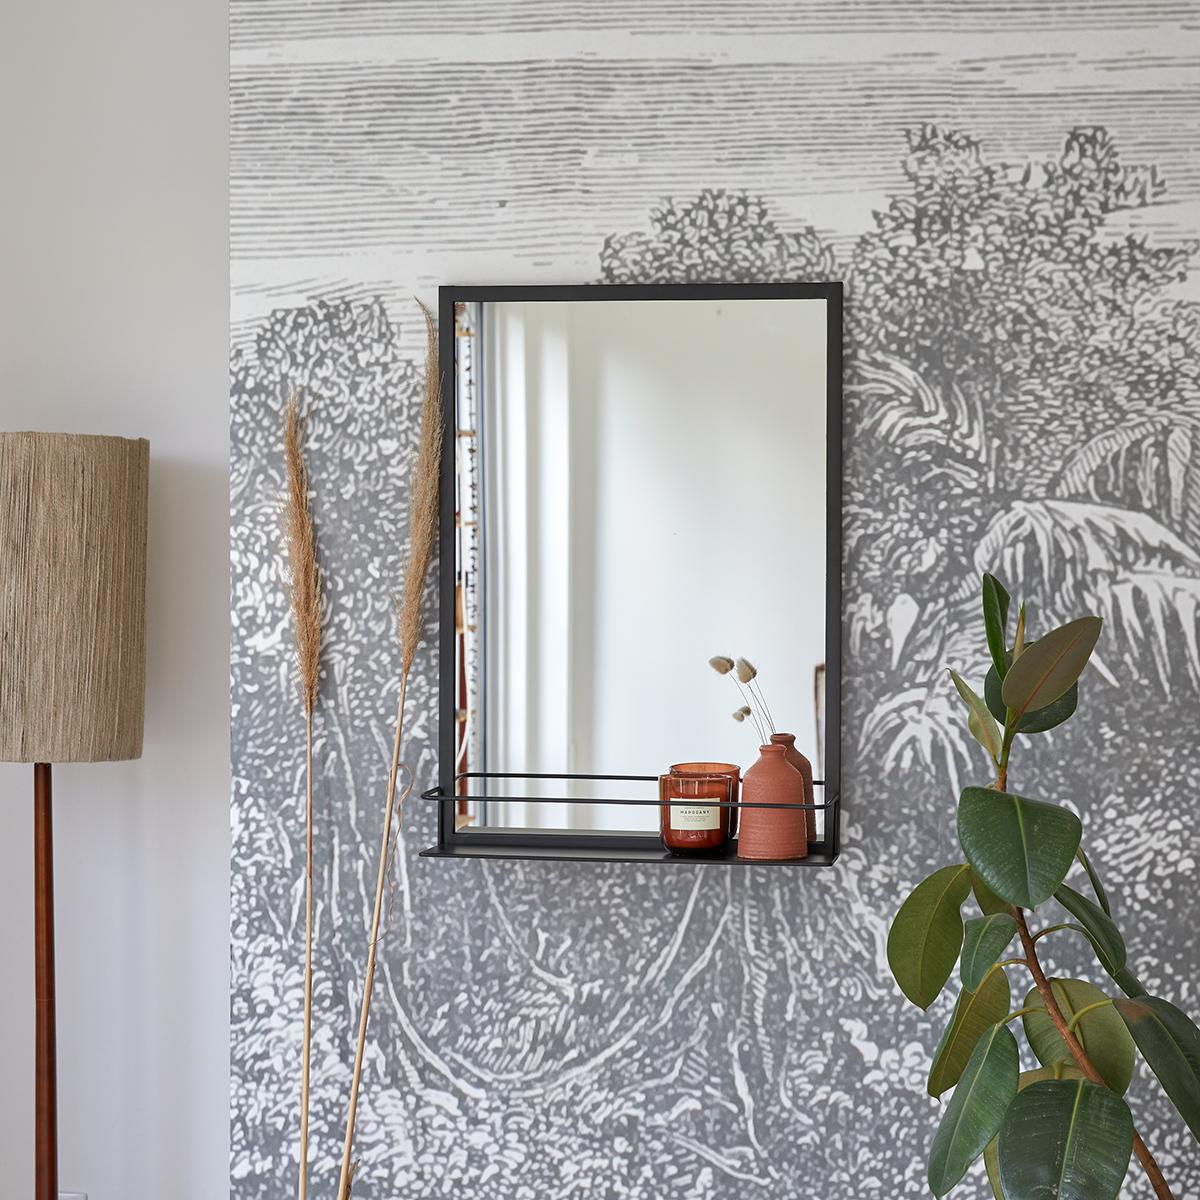 Lison decorative metal mirror 70x50 cm